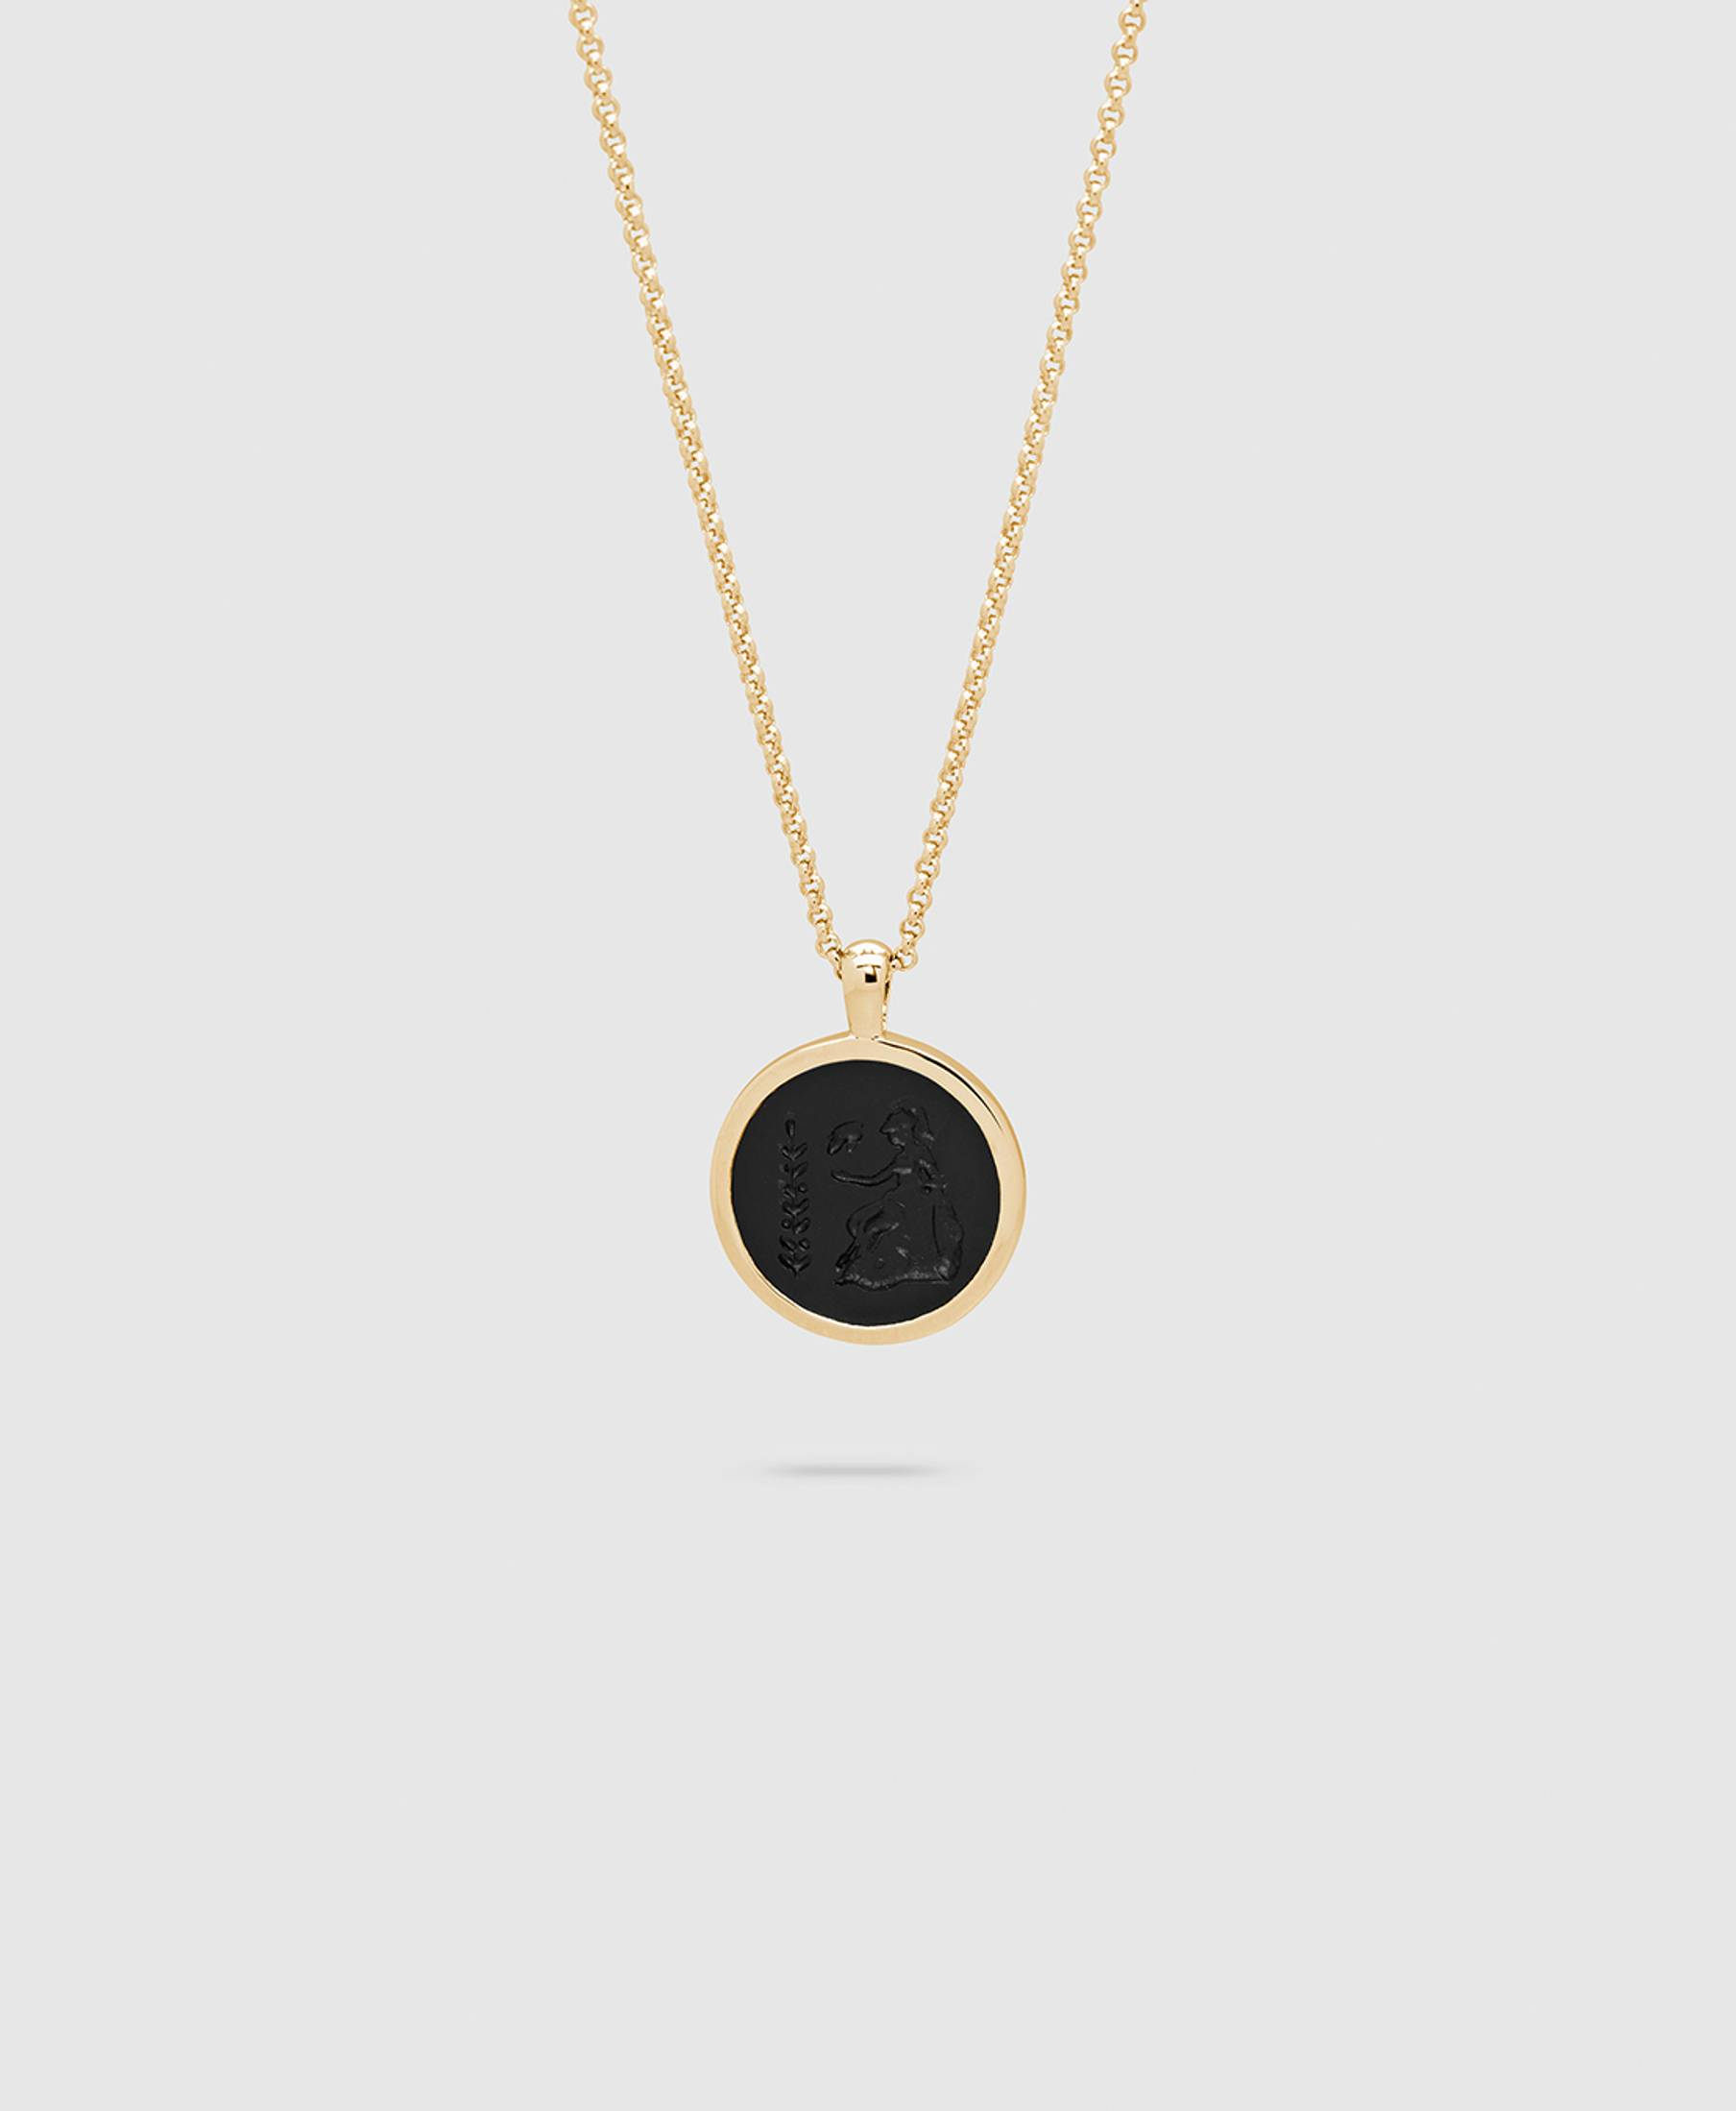 Athena Onyx Pendant S Gold